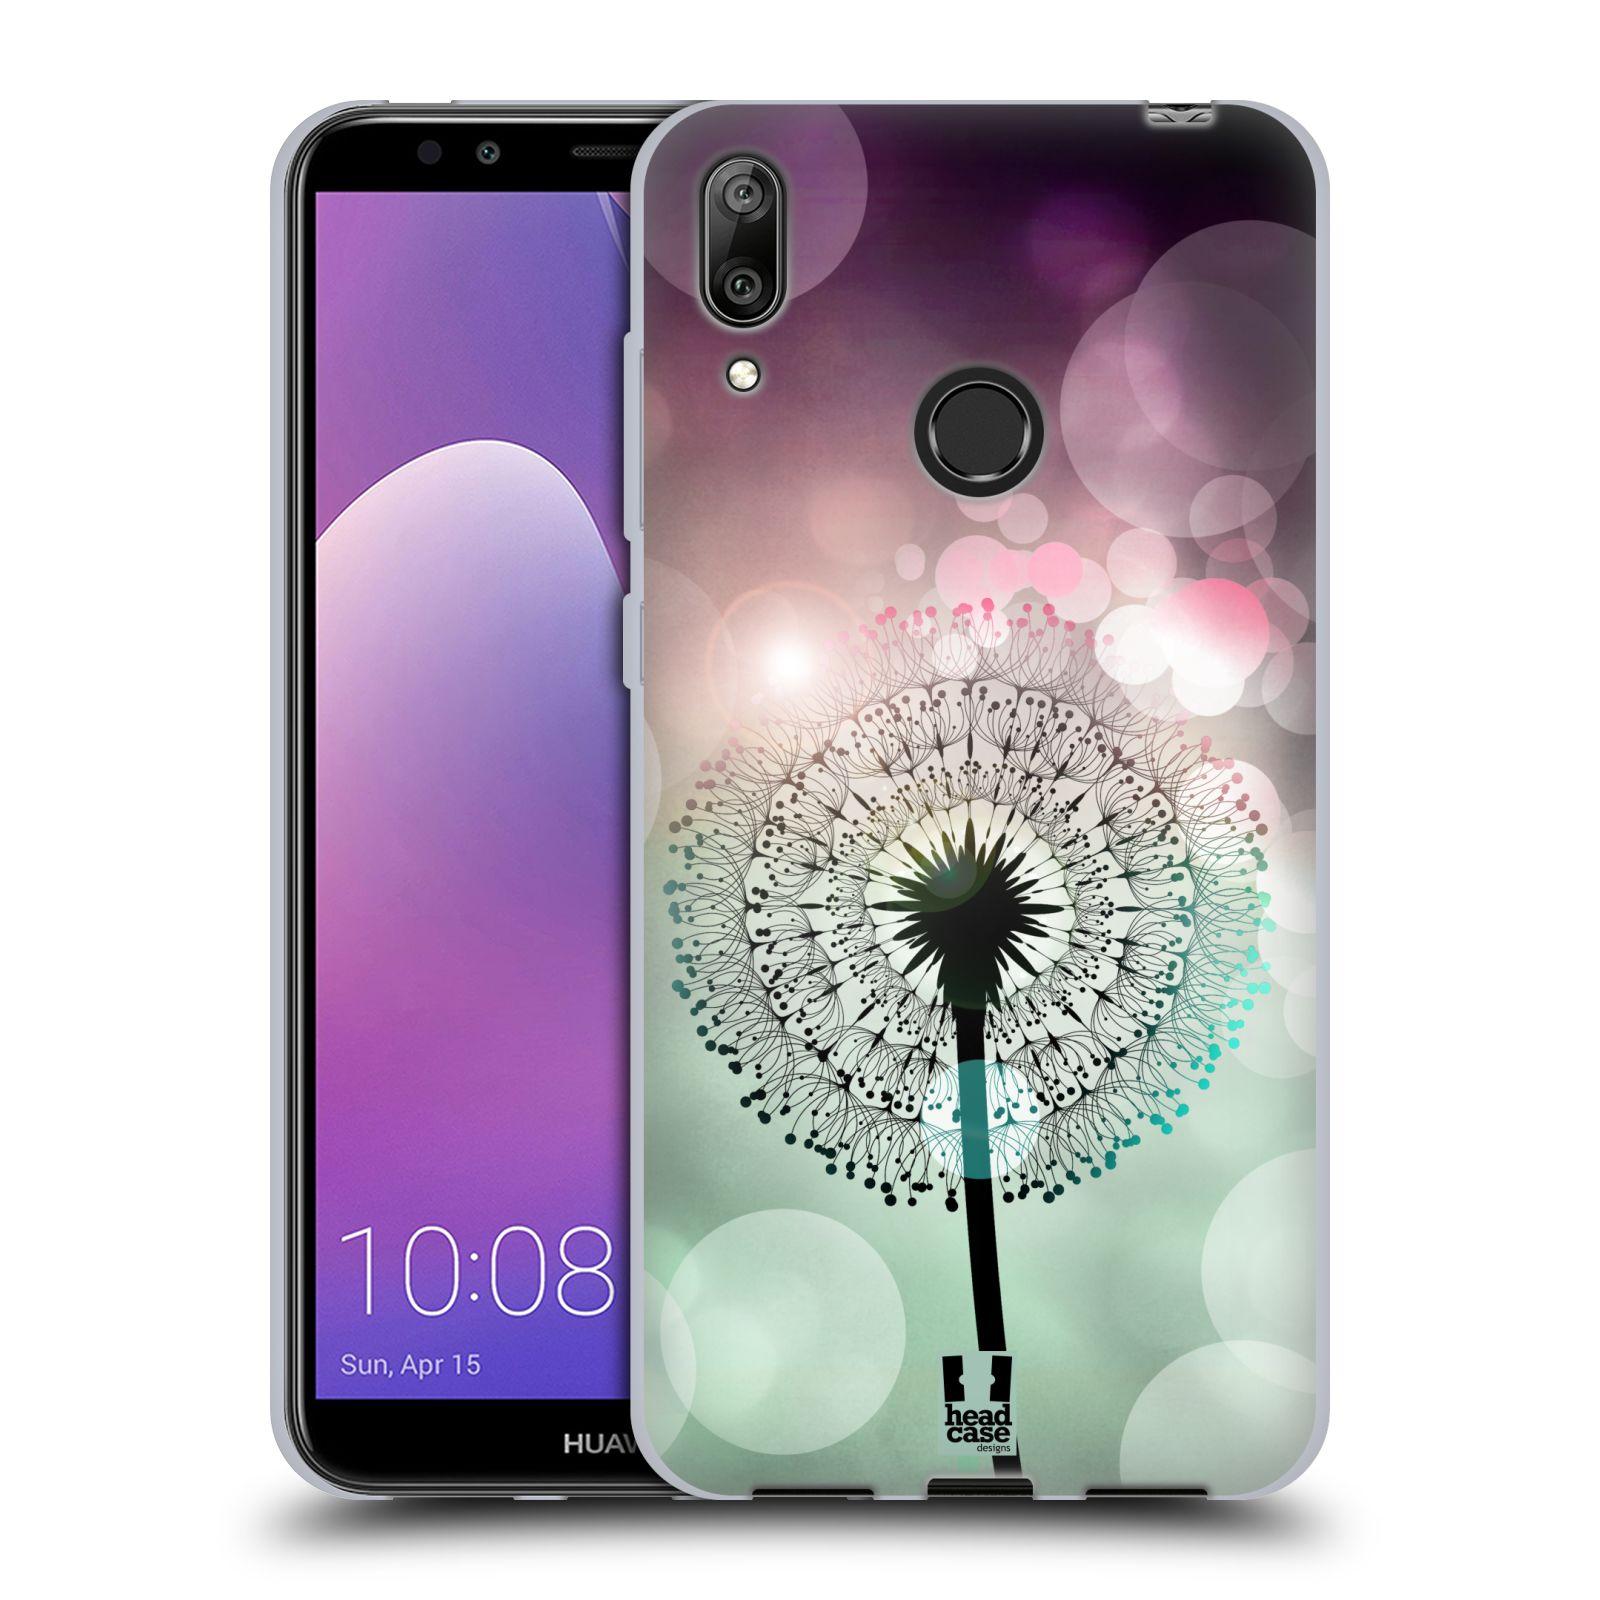 Silikonové pouzdro na mobil Huawei Y7 (2019) - Head Case - Pampeliškové odlesky